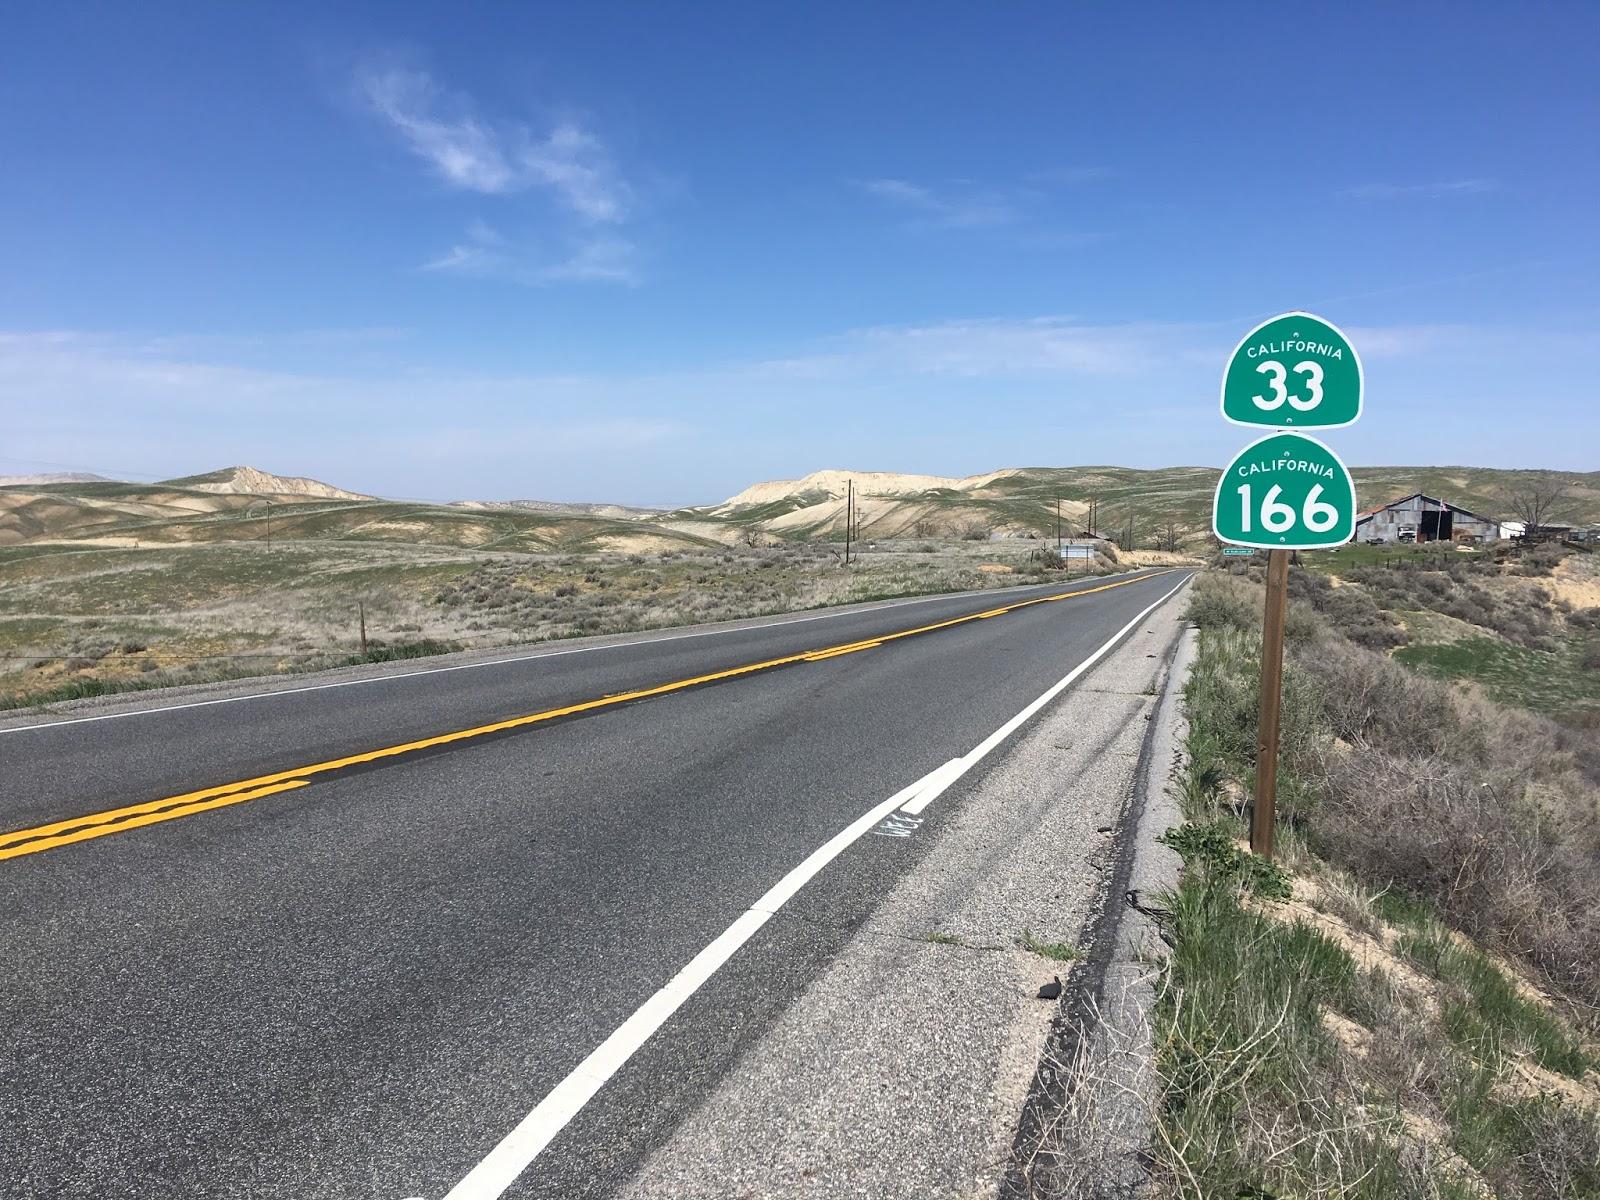 California State Route 166